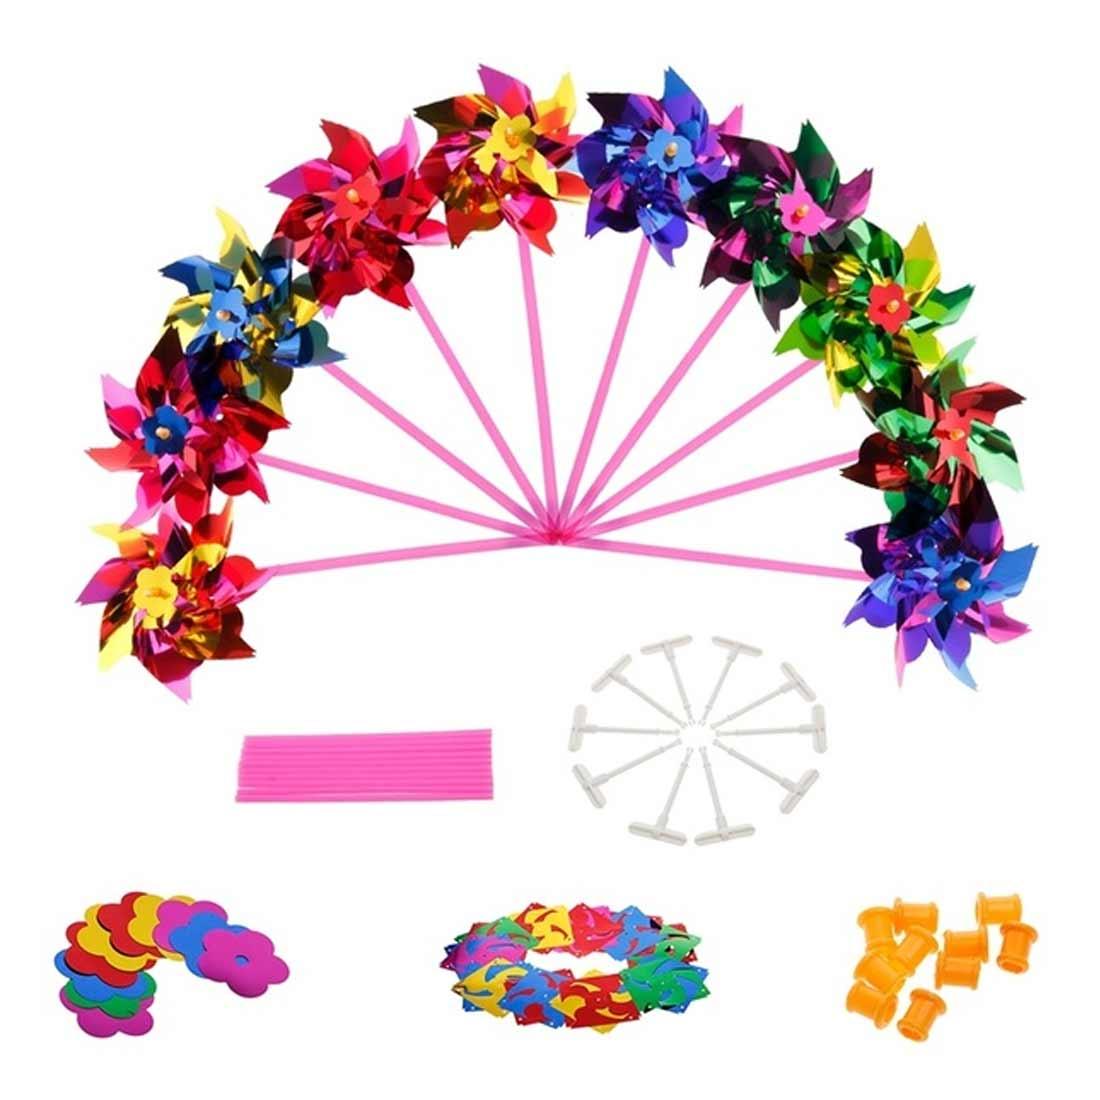 10pcs Garden Lawn Party Decor Toy Gift Boys Girls Plastic Windmill Pinwheel Wind Spinner Kids